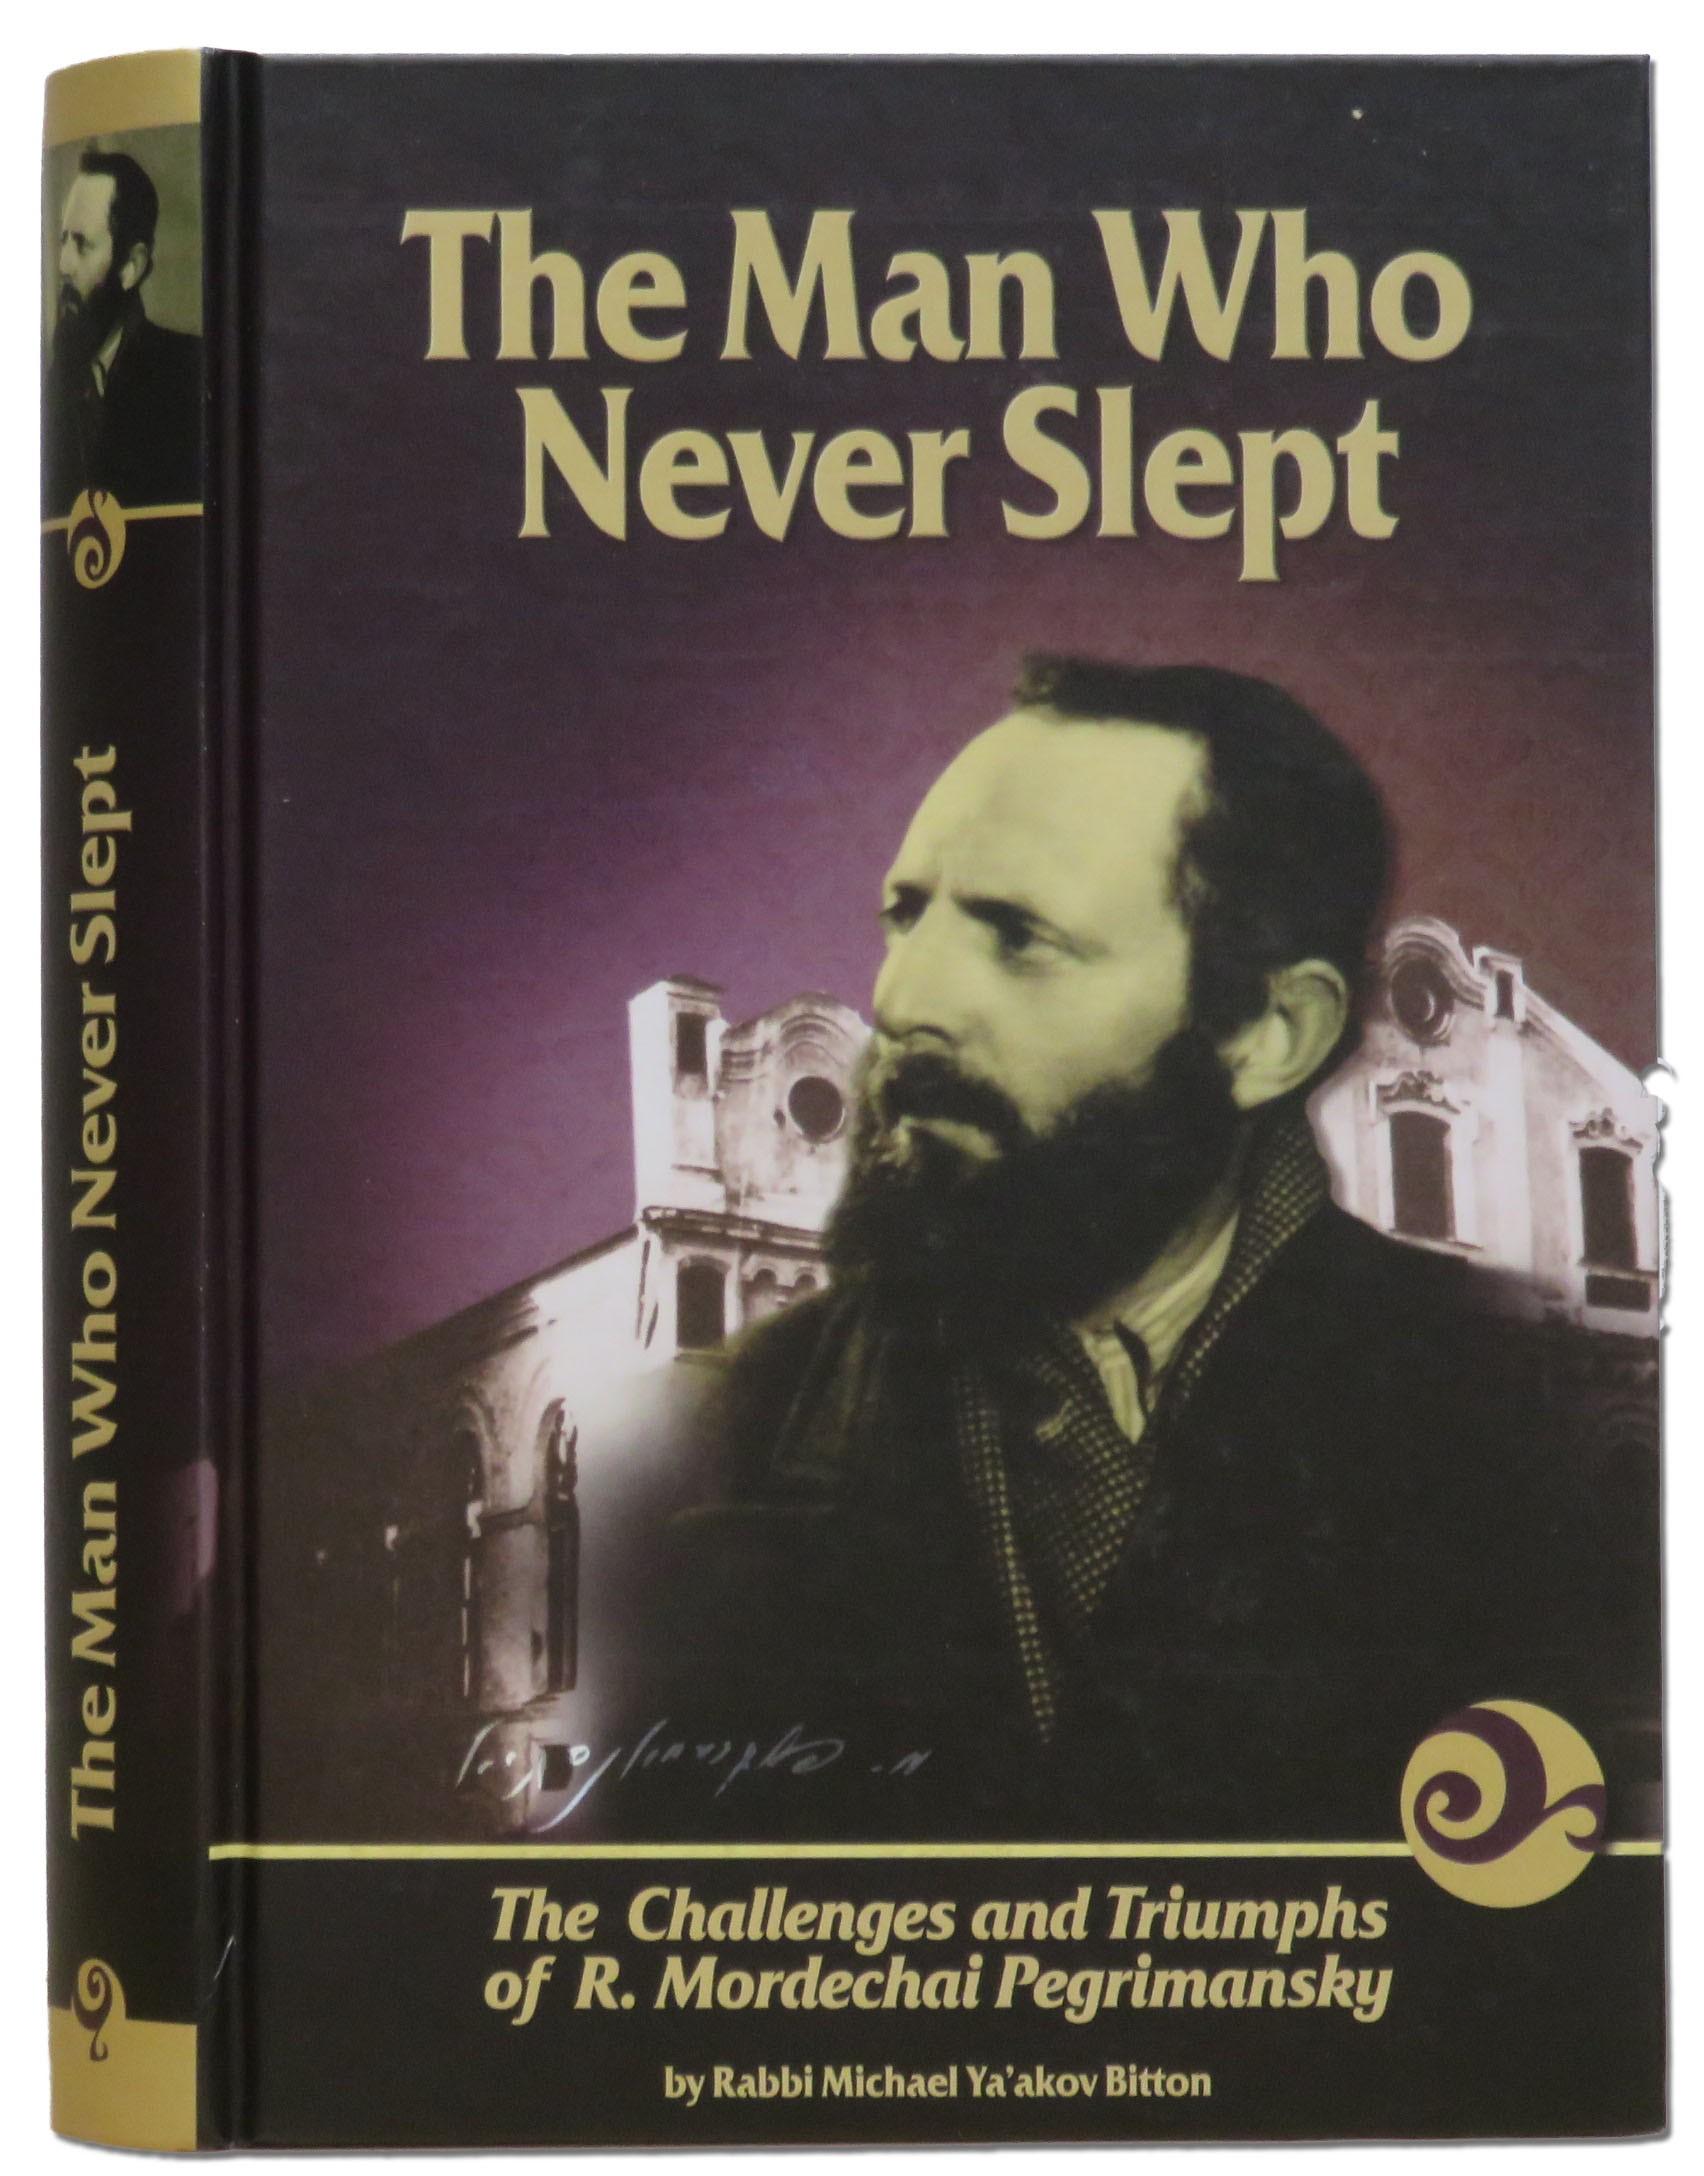 The Man Who Never Slept - R. Mordechai Pegrimansky